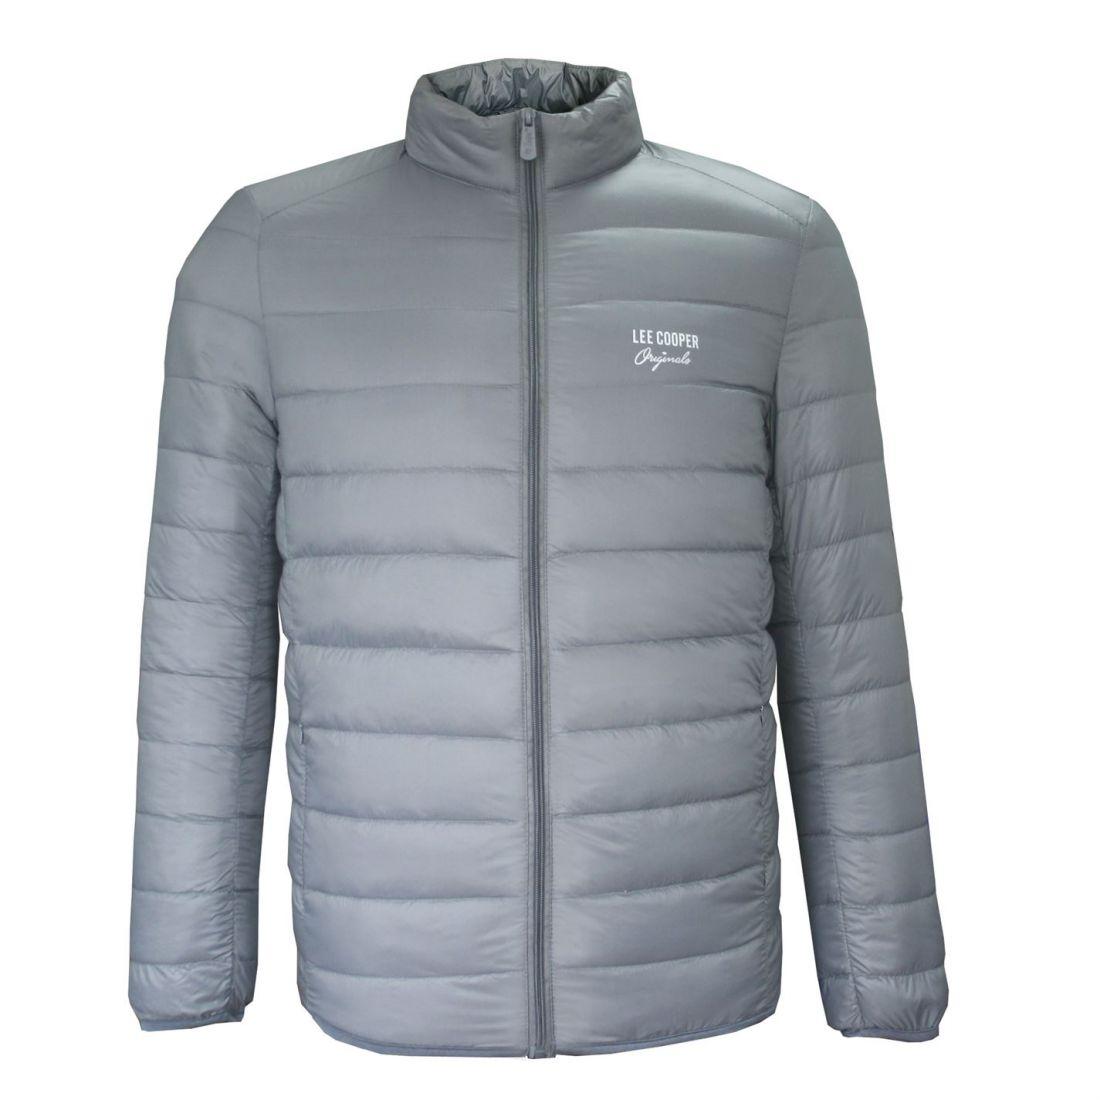 Lee Cooper Mens Hooded Parka Jacket Coat Top Zip Full Warm